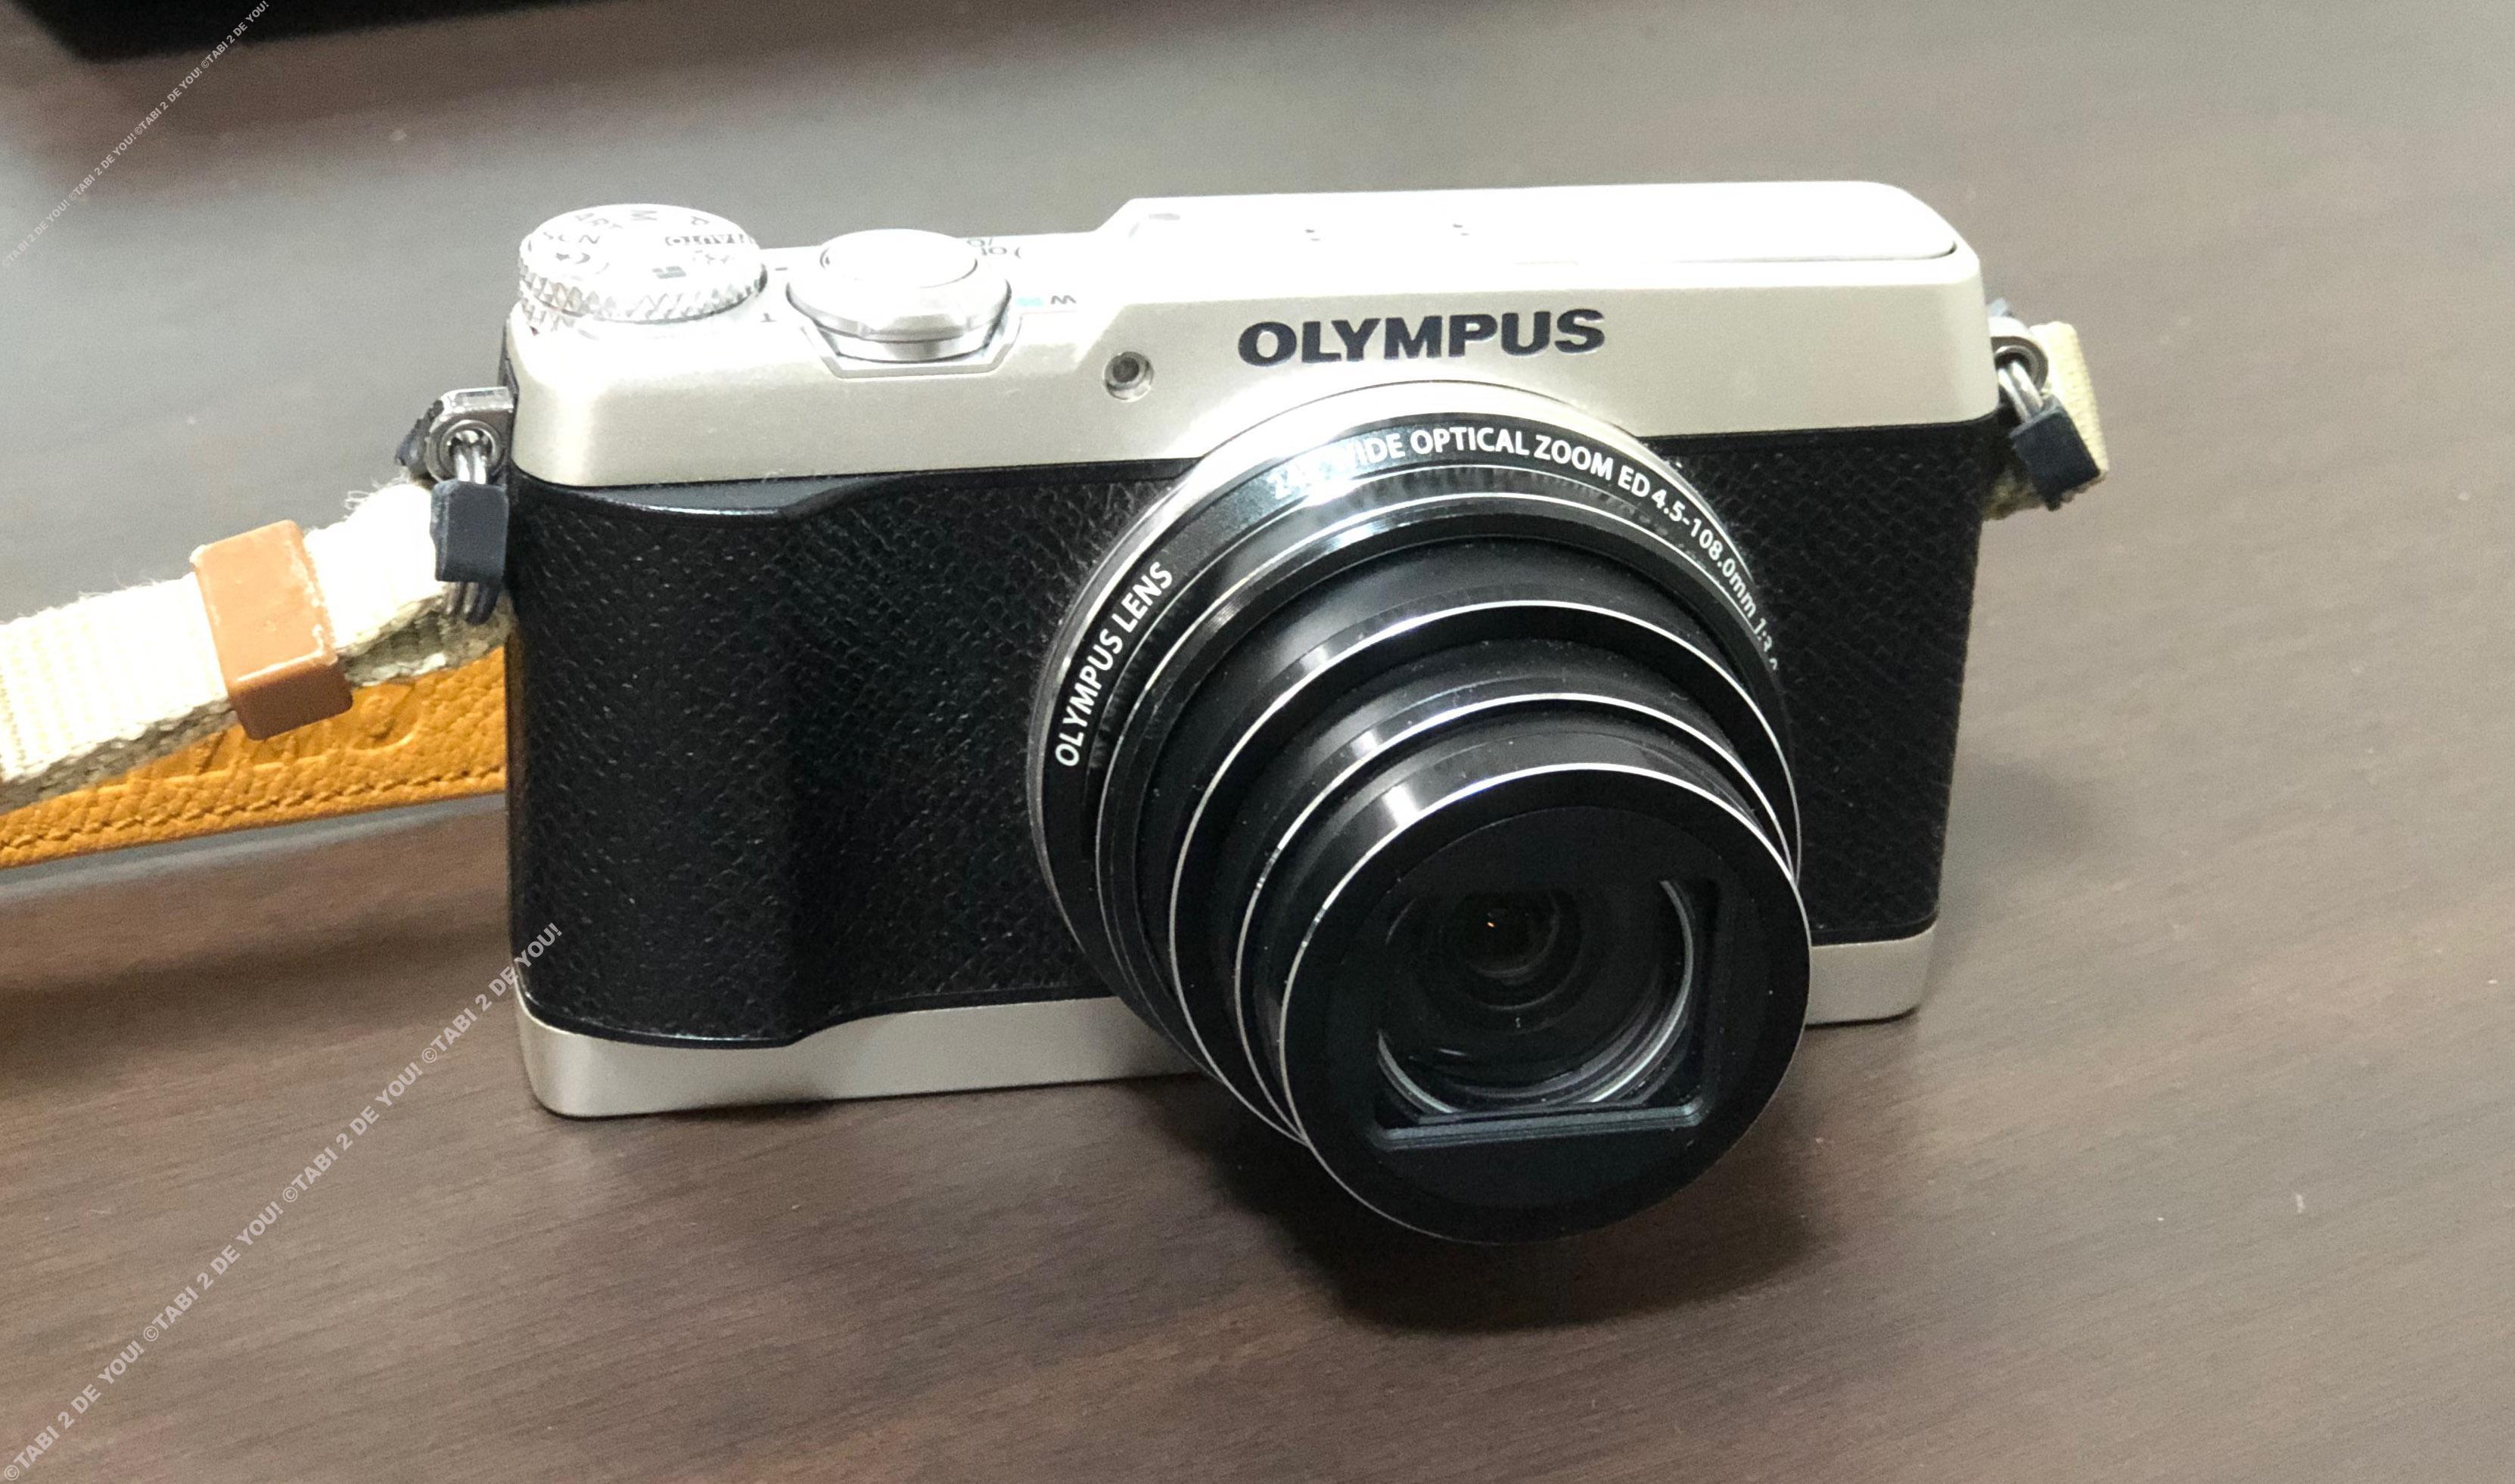 OLYMPUS SH-3